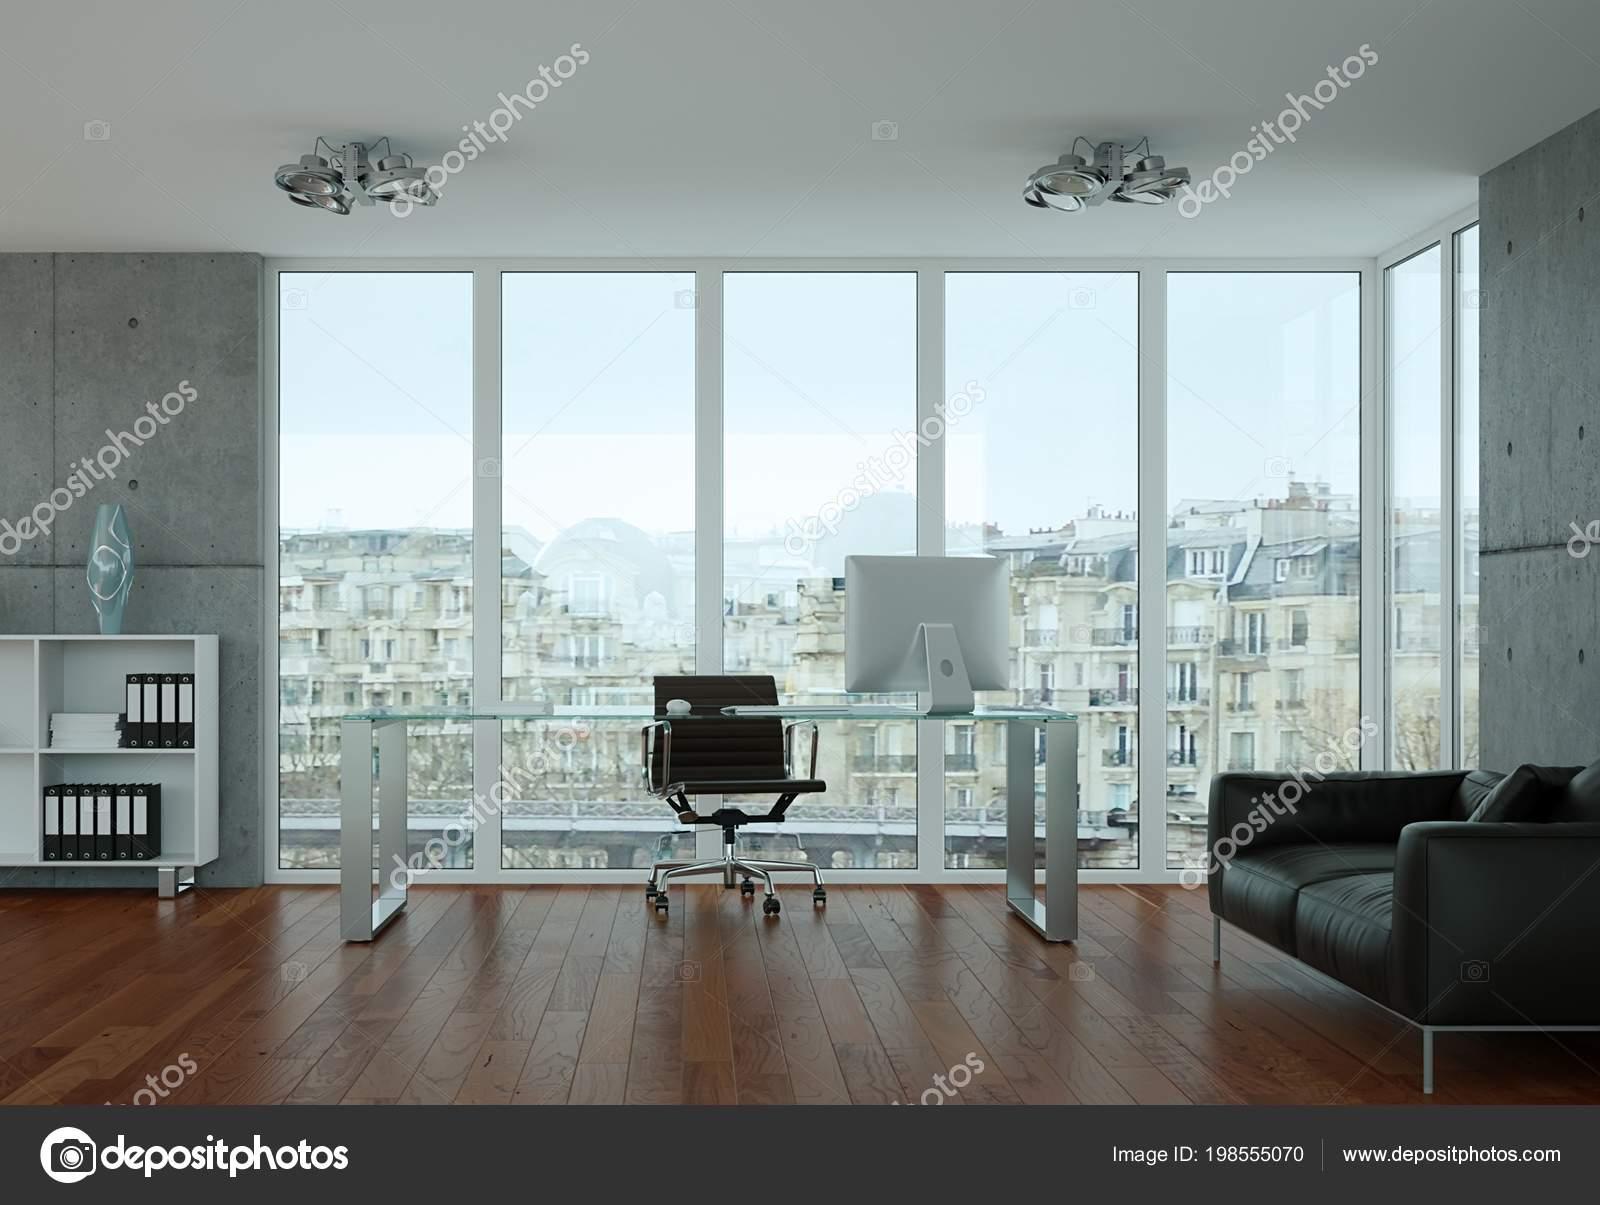 Moderne büro innenarchitektur mit betonmauer u stockfoto